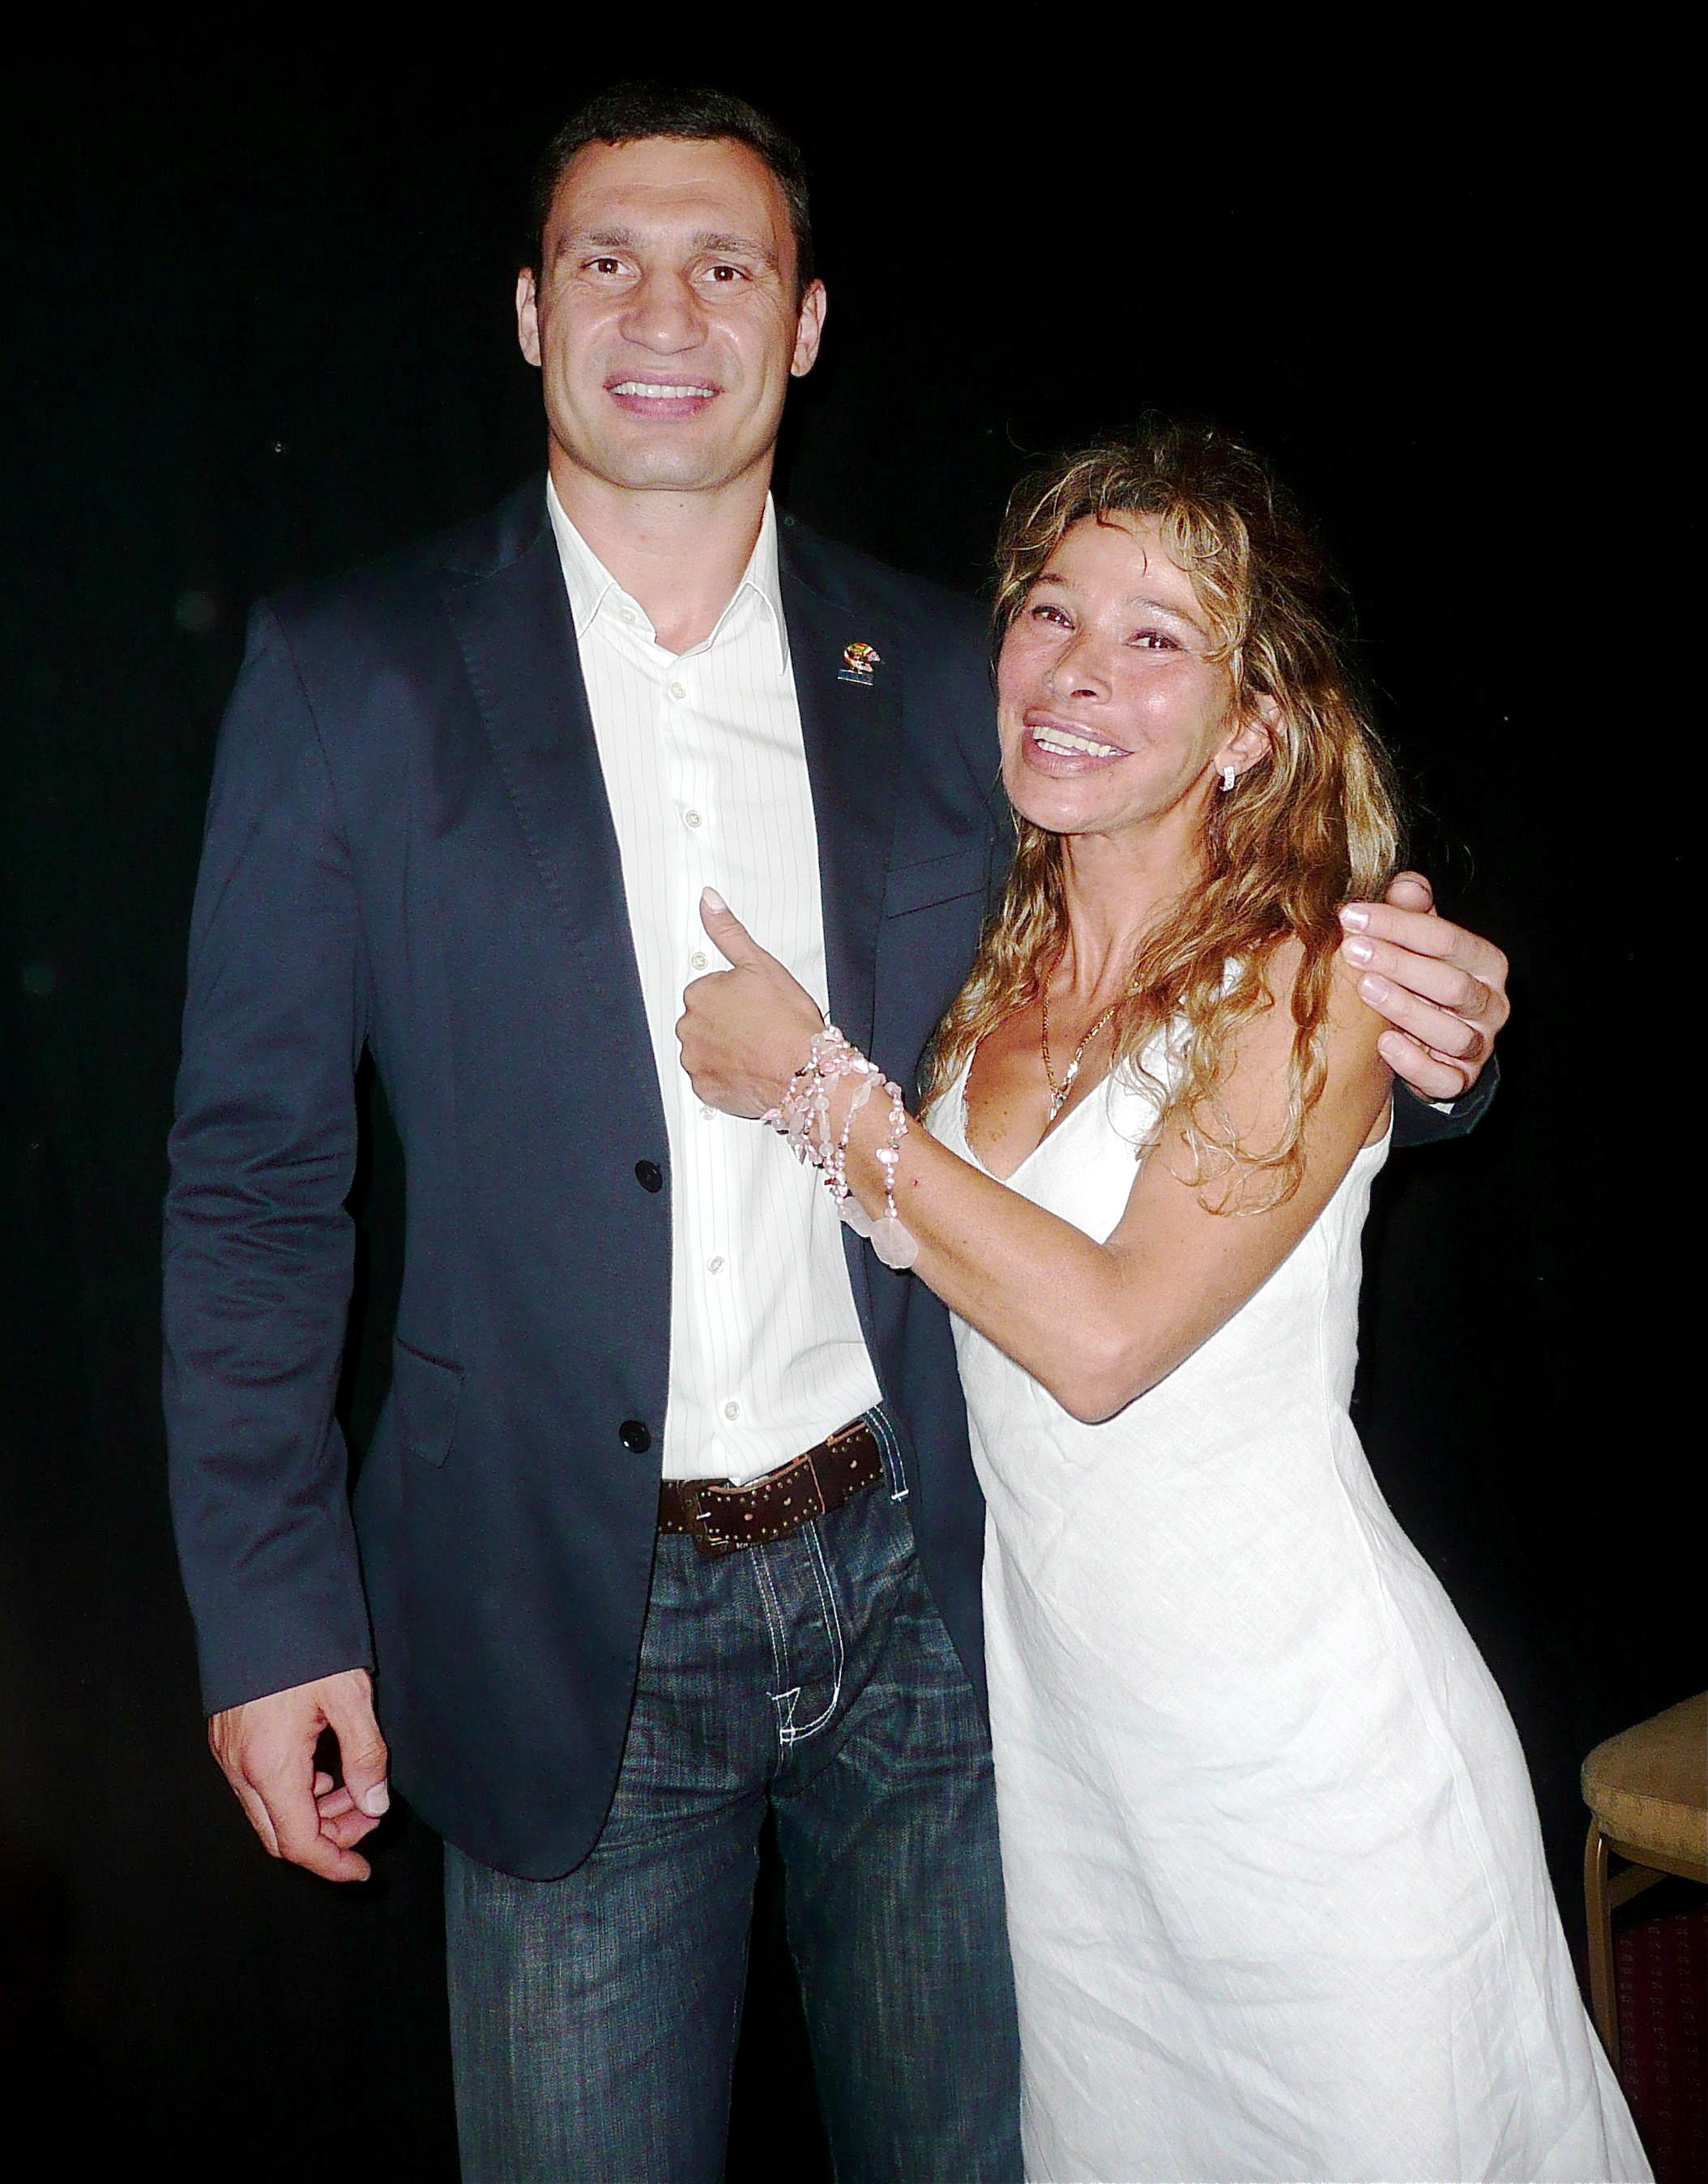 VITALI KLITSCHKO & GIANNA GARBELLI WBC CARDIFF